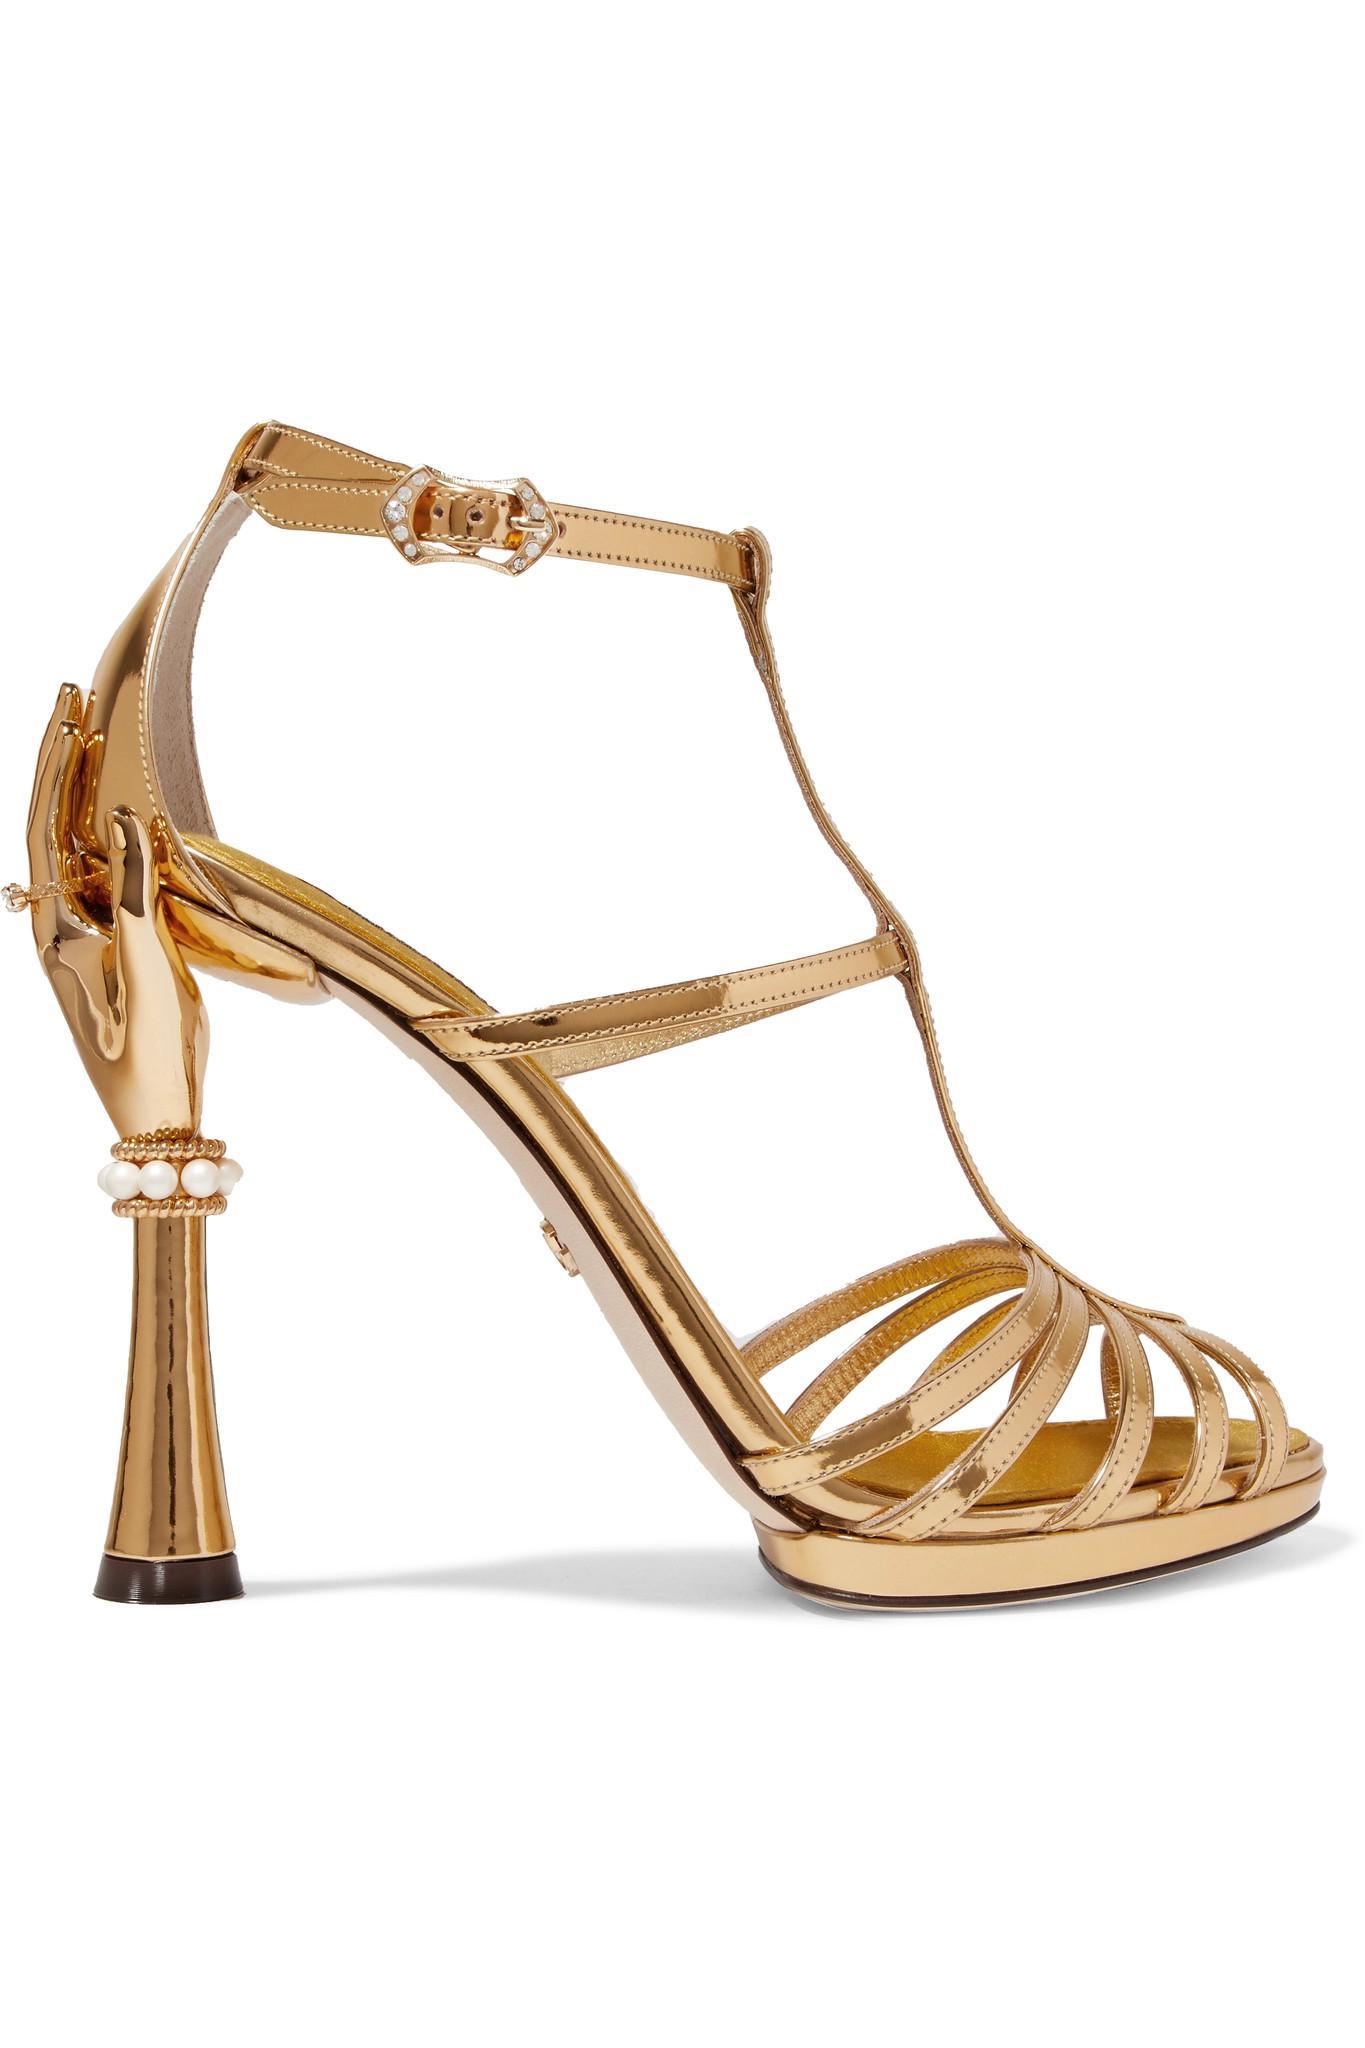 Embellished Mirrored-leather Sandals - Gold Dolce & Gabbana ybGjOGl5a